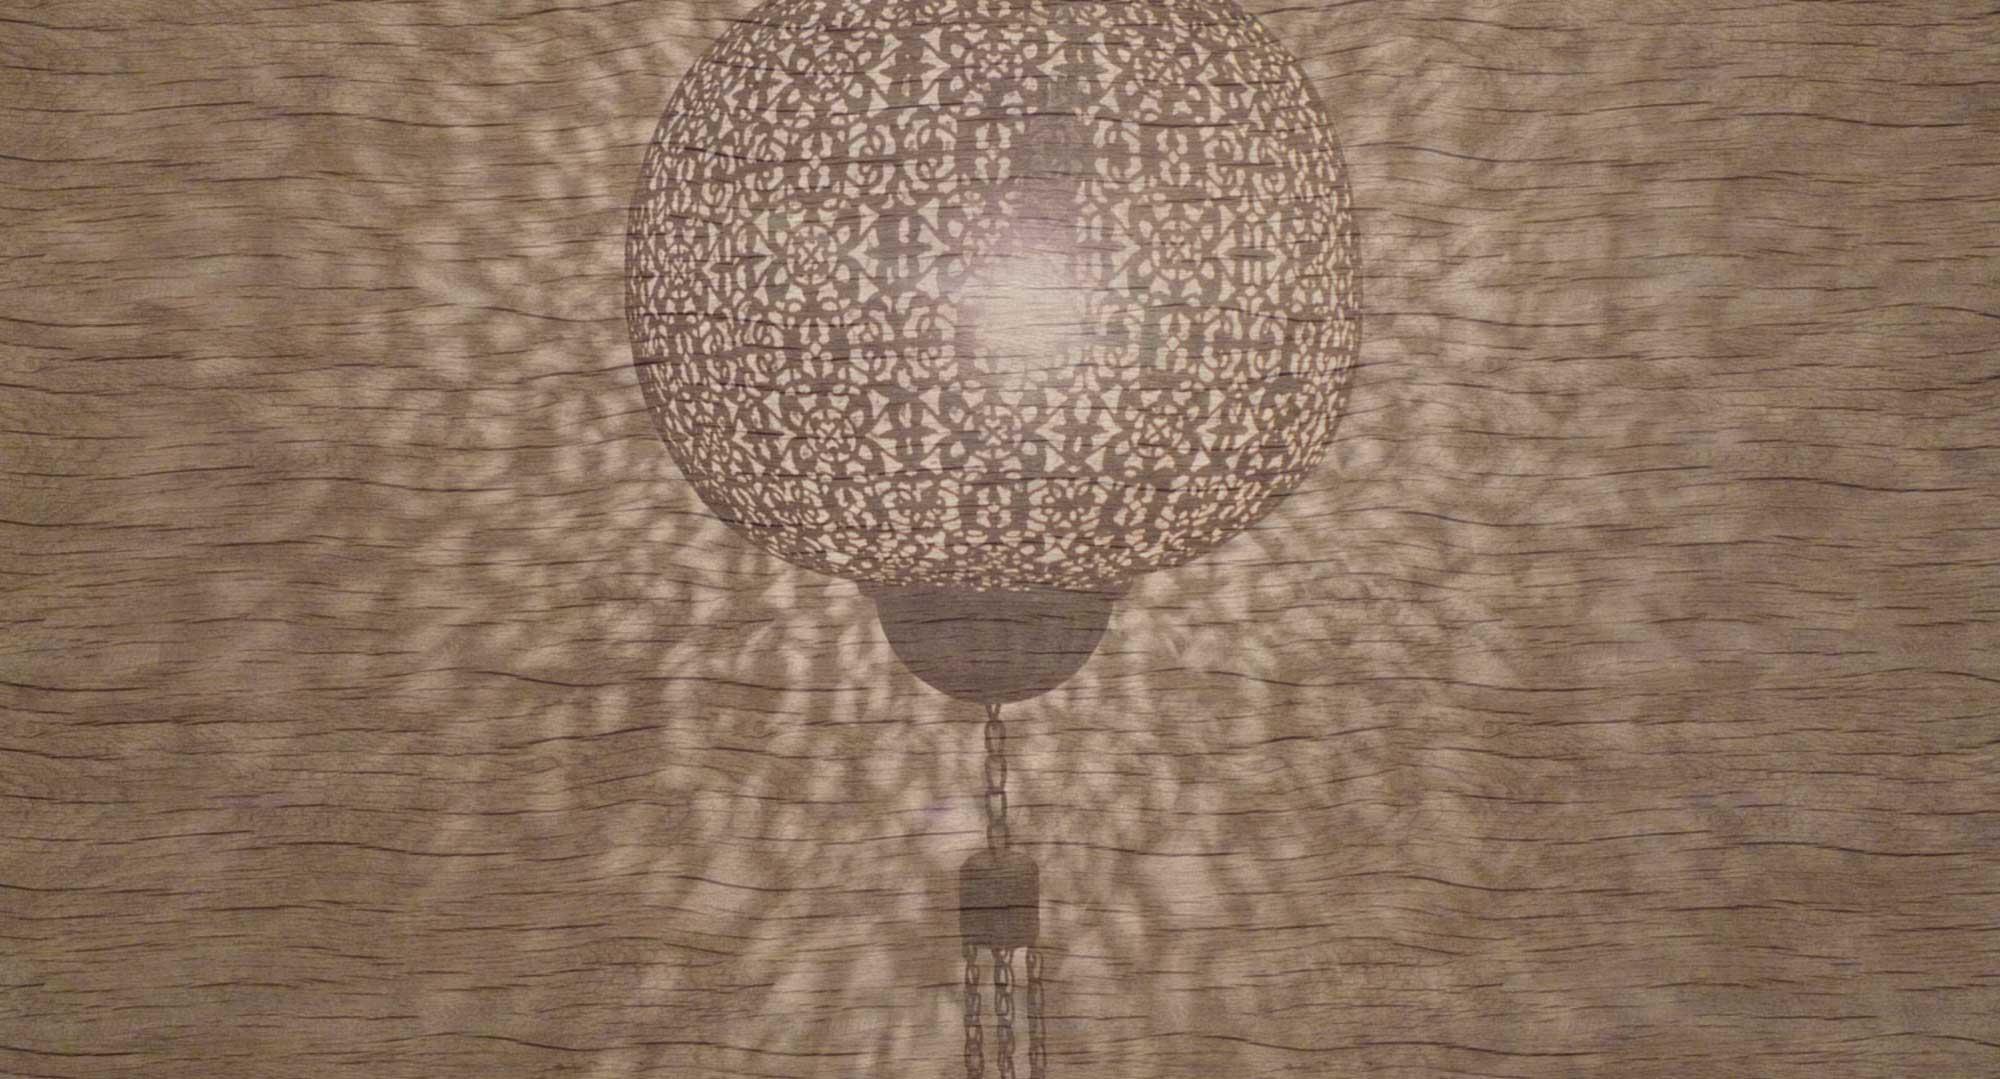 Wandverlichting   wandlampen als sfeerverlichting   glasmozaiek turks